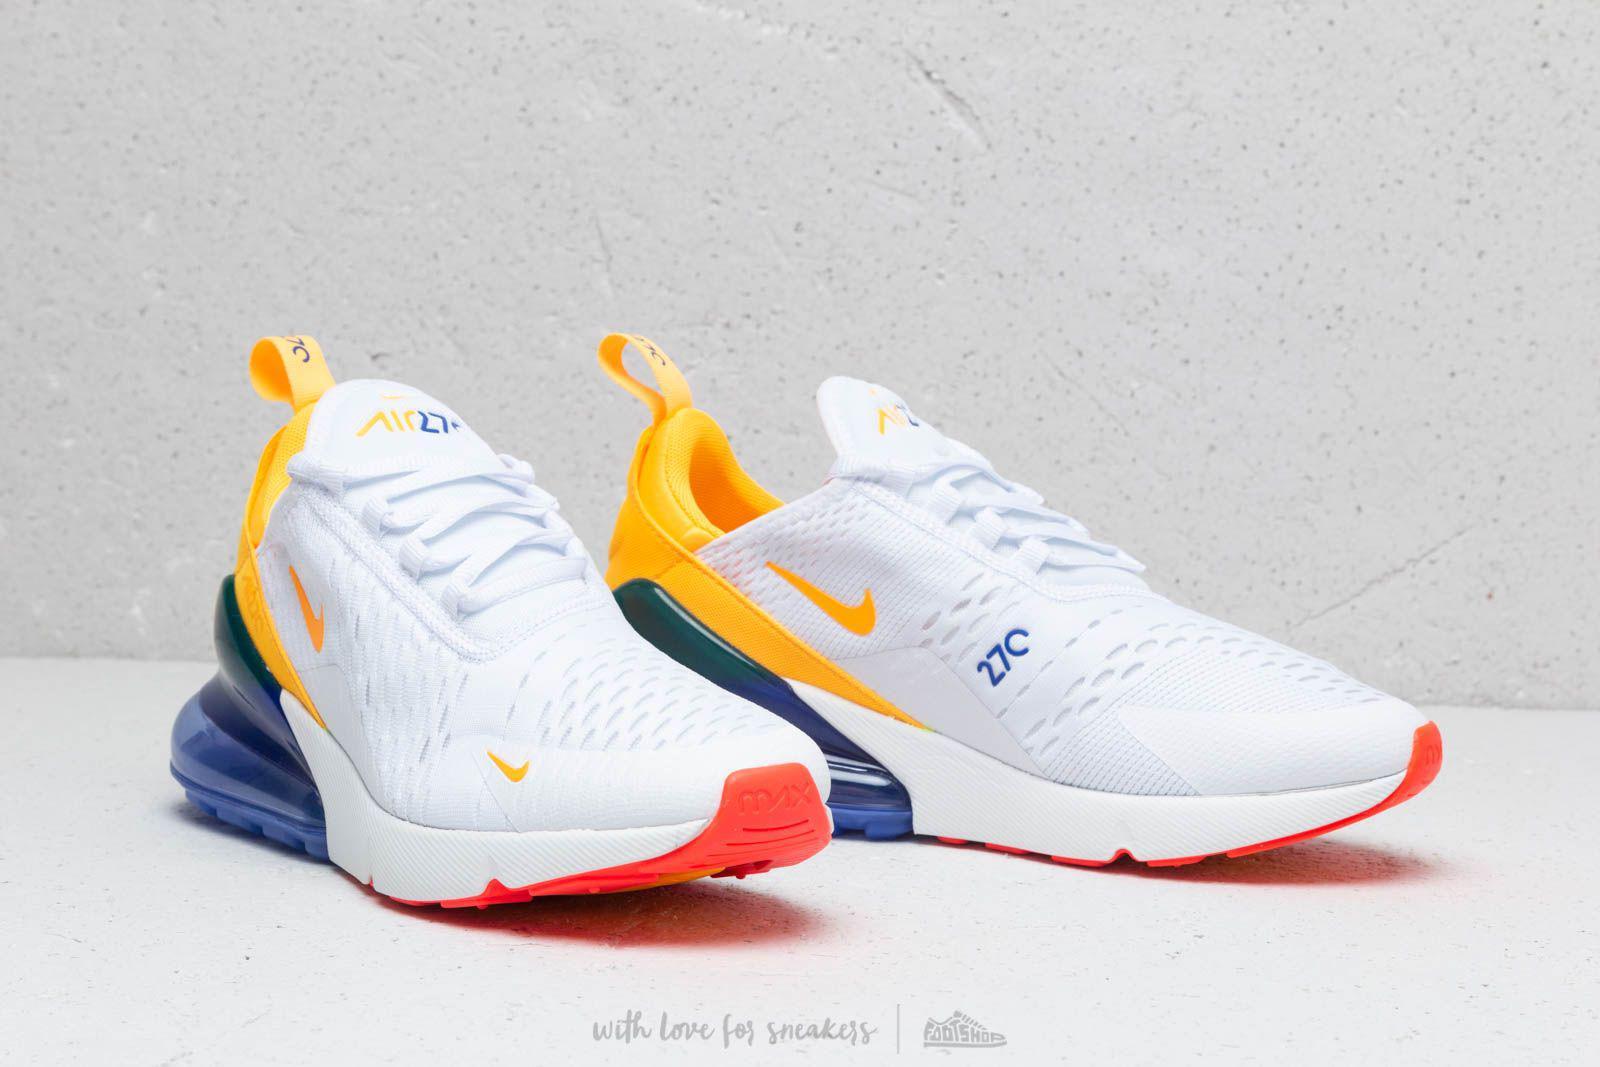 hot sale online 9c43c 71ea7 Lyst - Nike W Air Max 270 White  Laser Orange-hyper Violet nike air max 270  laser orange